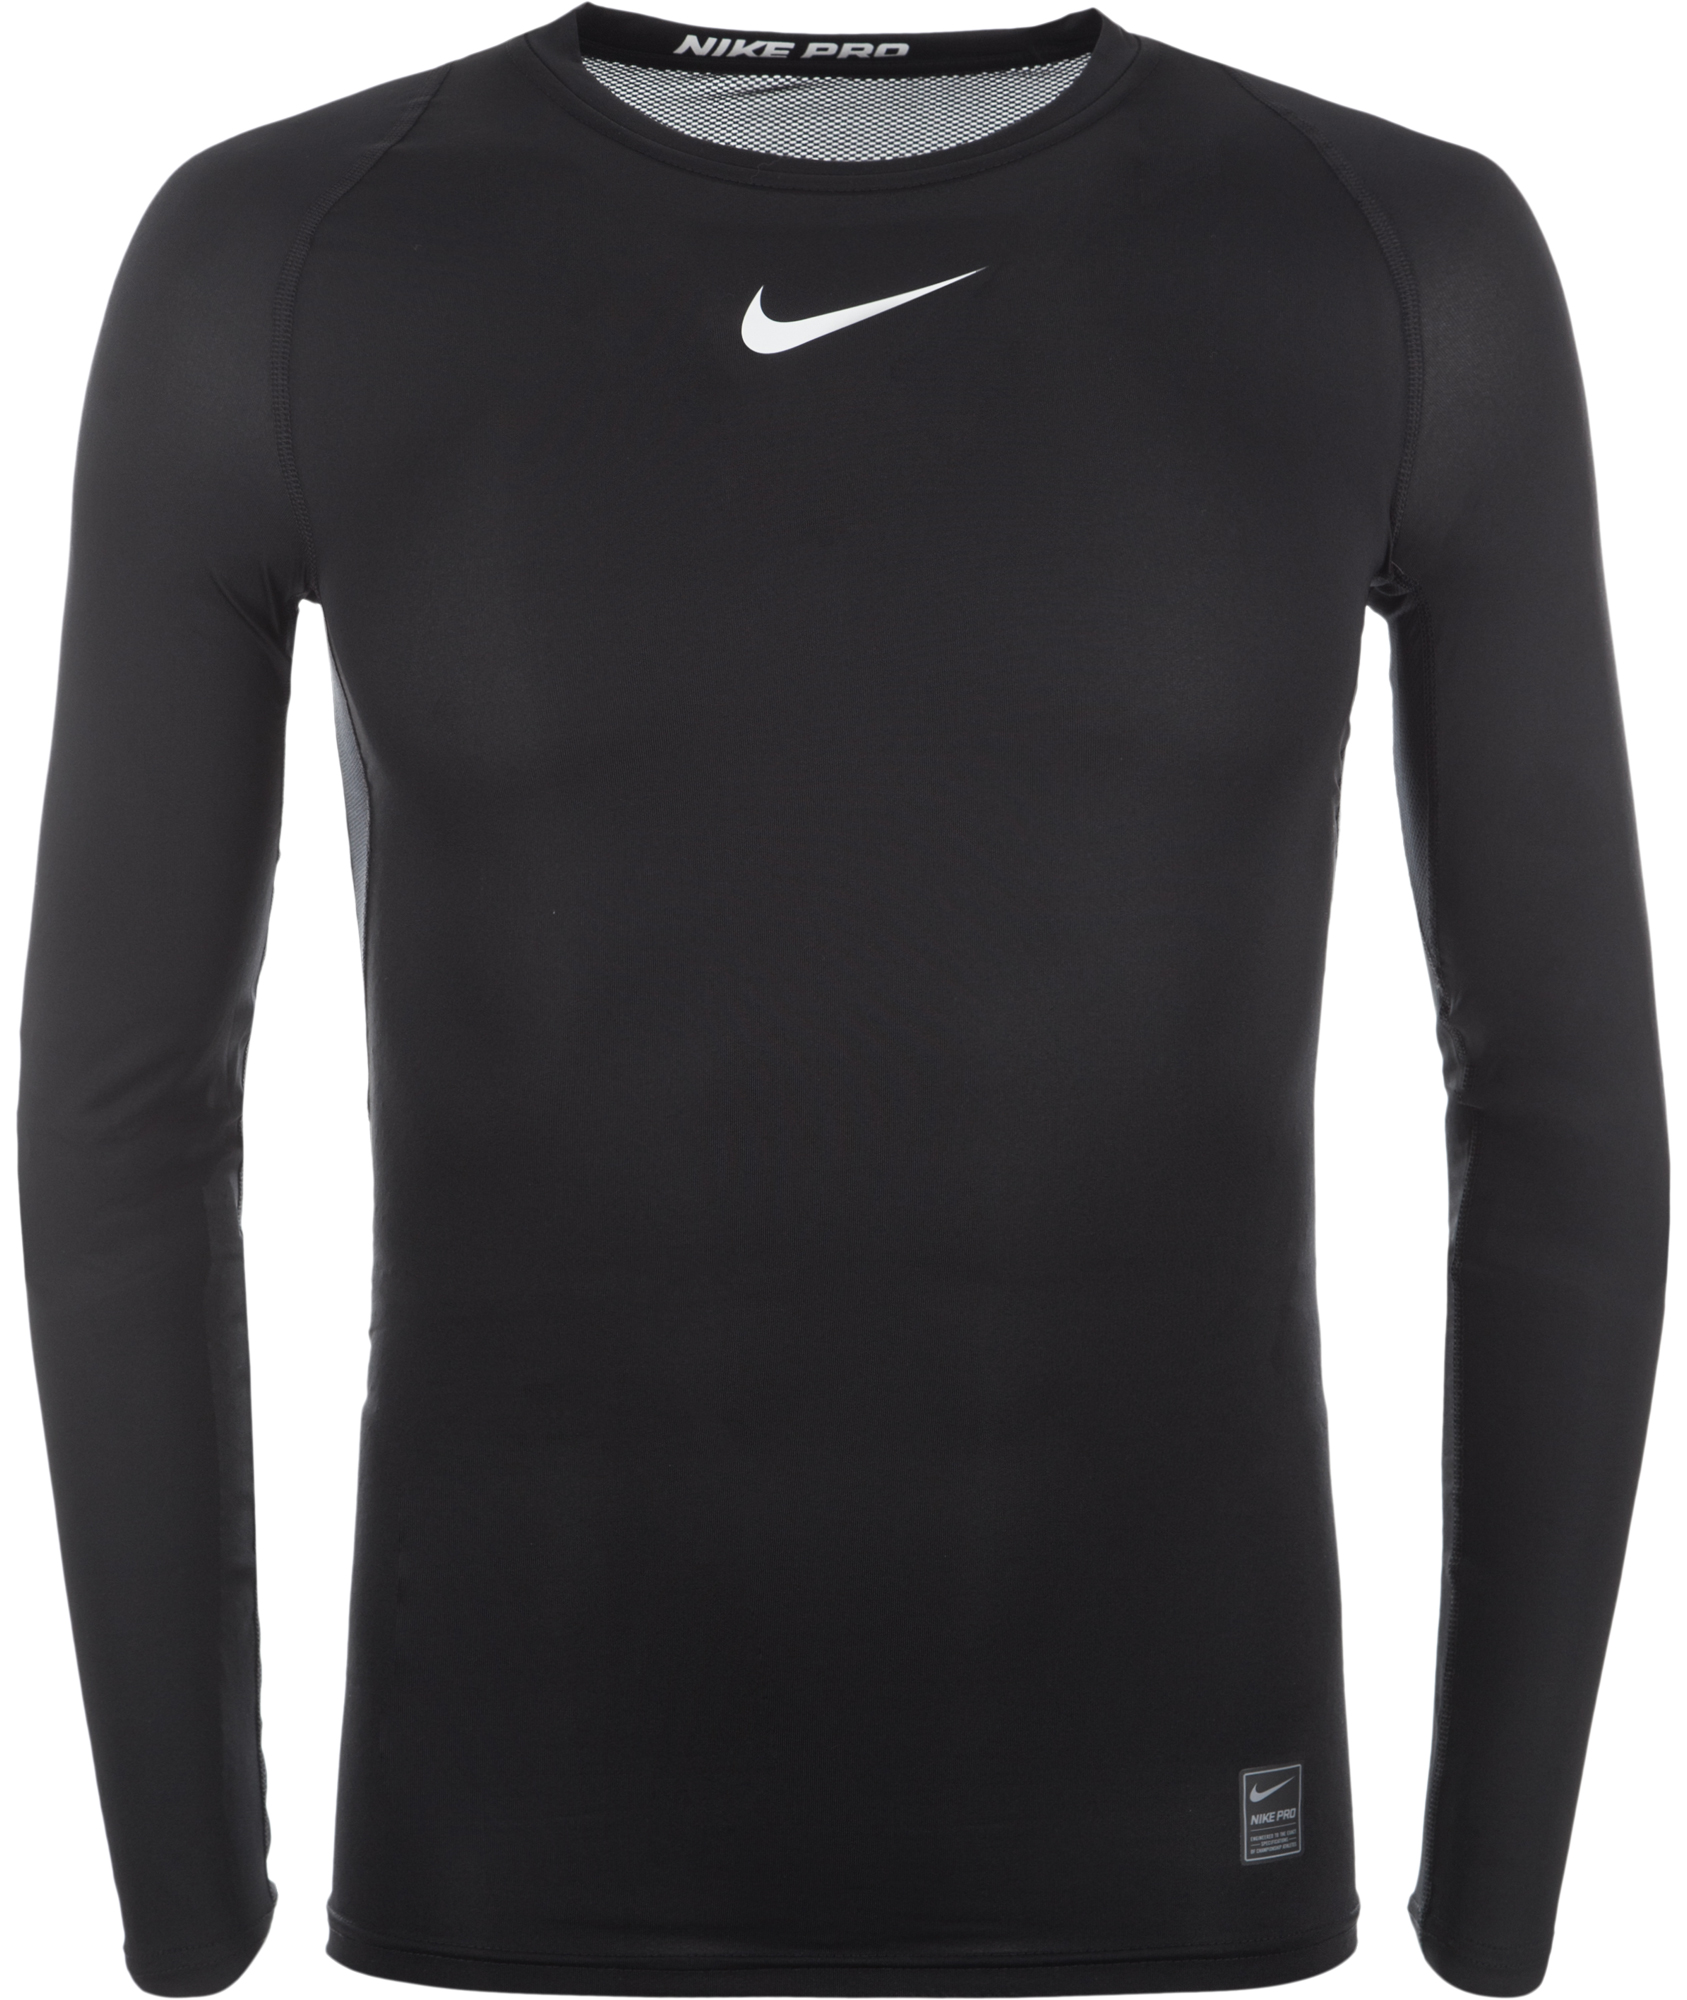 Nike Футболка с длинным рукавом мужская Nike Pro, размер 54-56 цена и фото